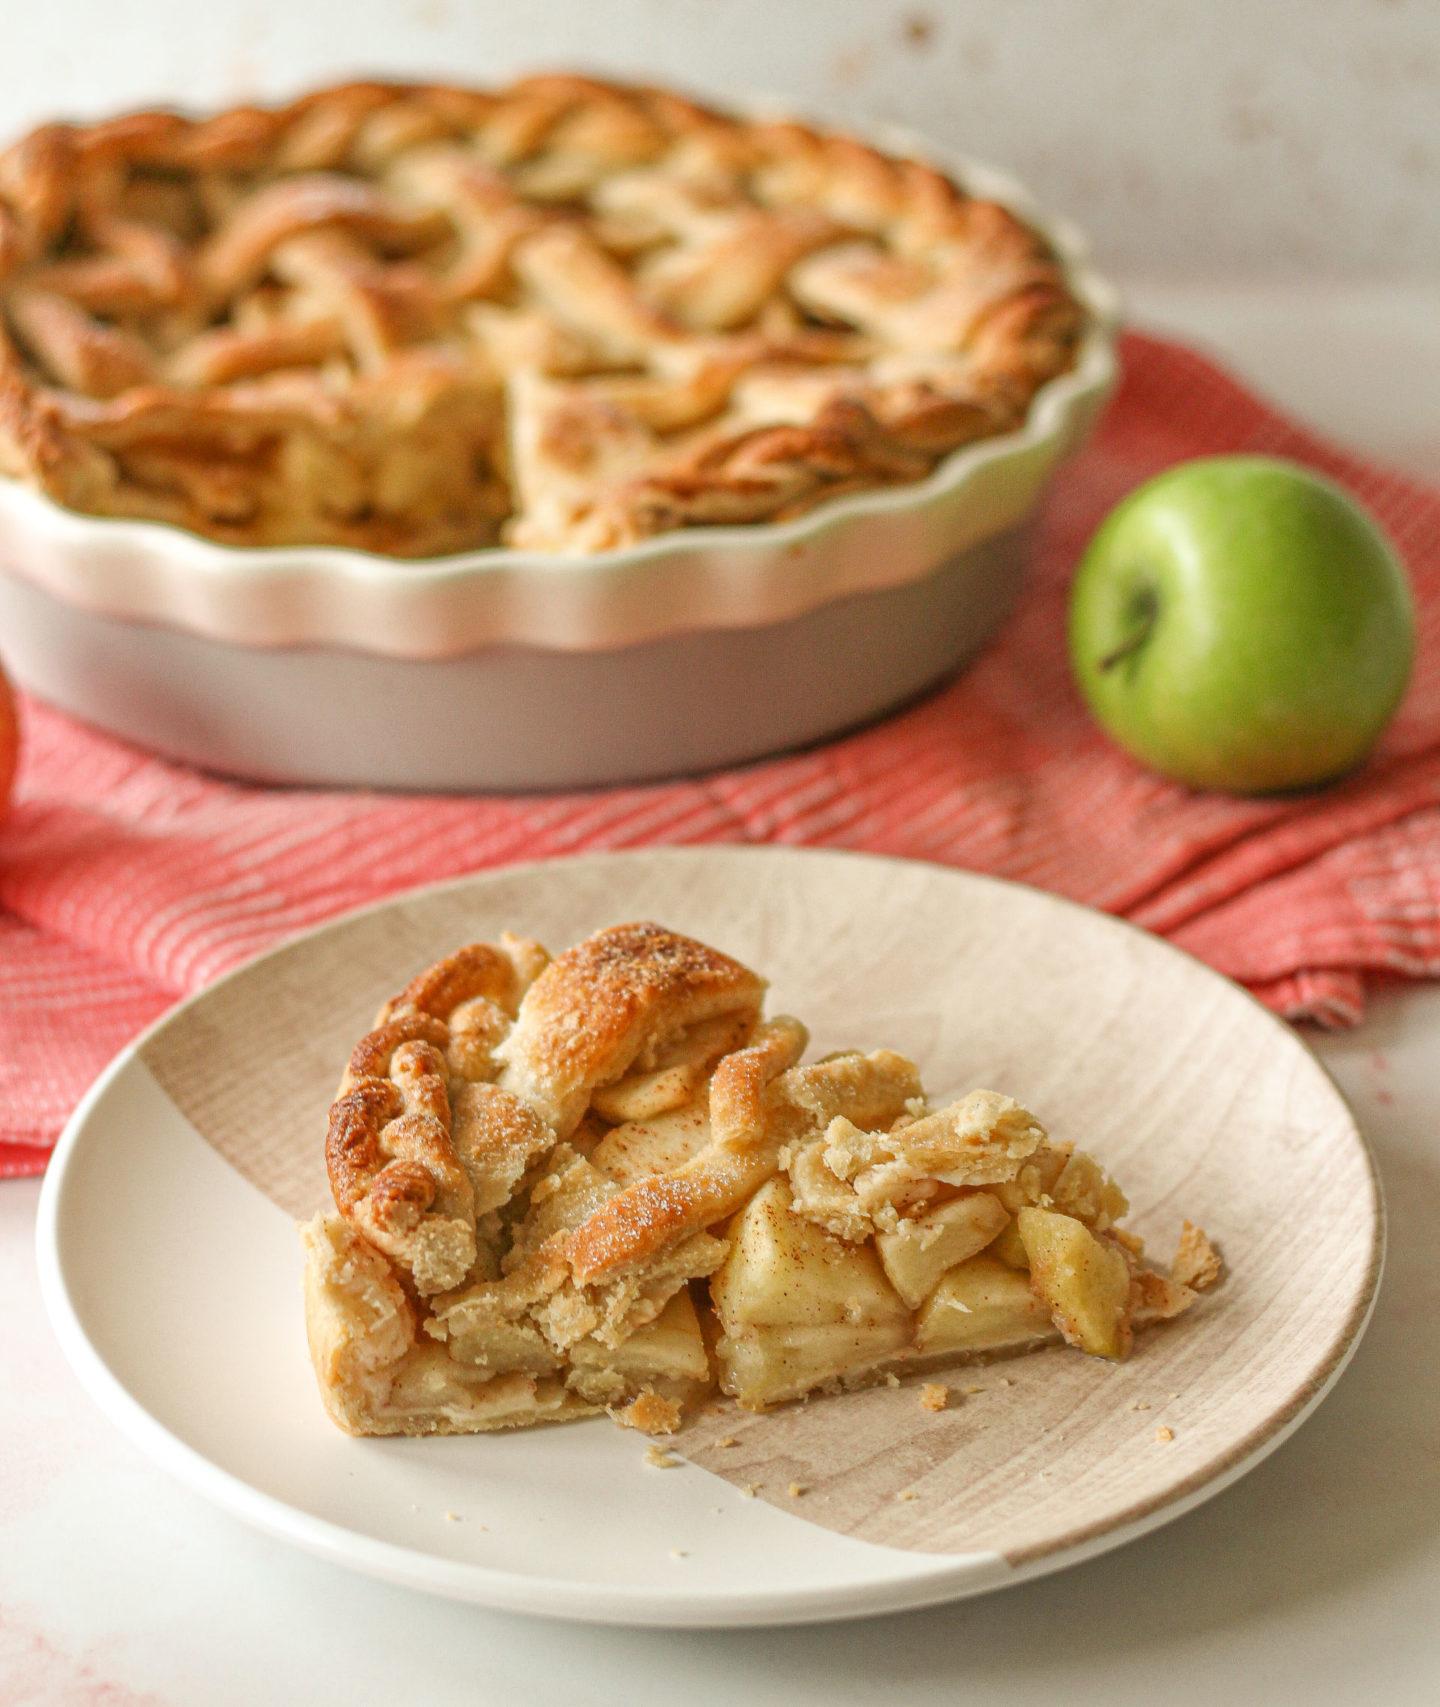 Slice of lattice apple pie with whole lattice apple pie blurred in background